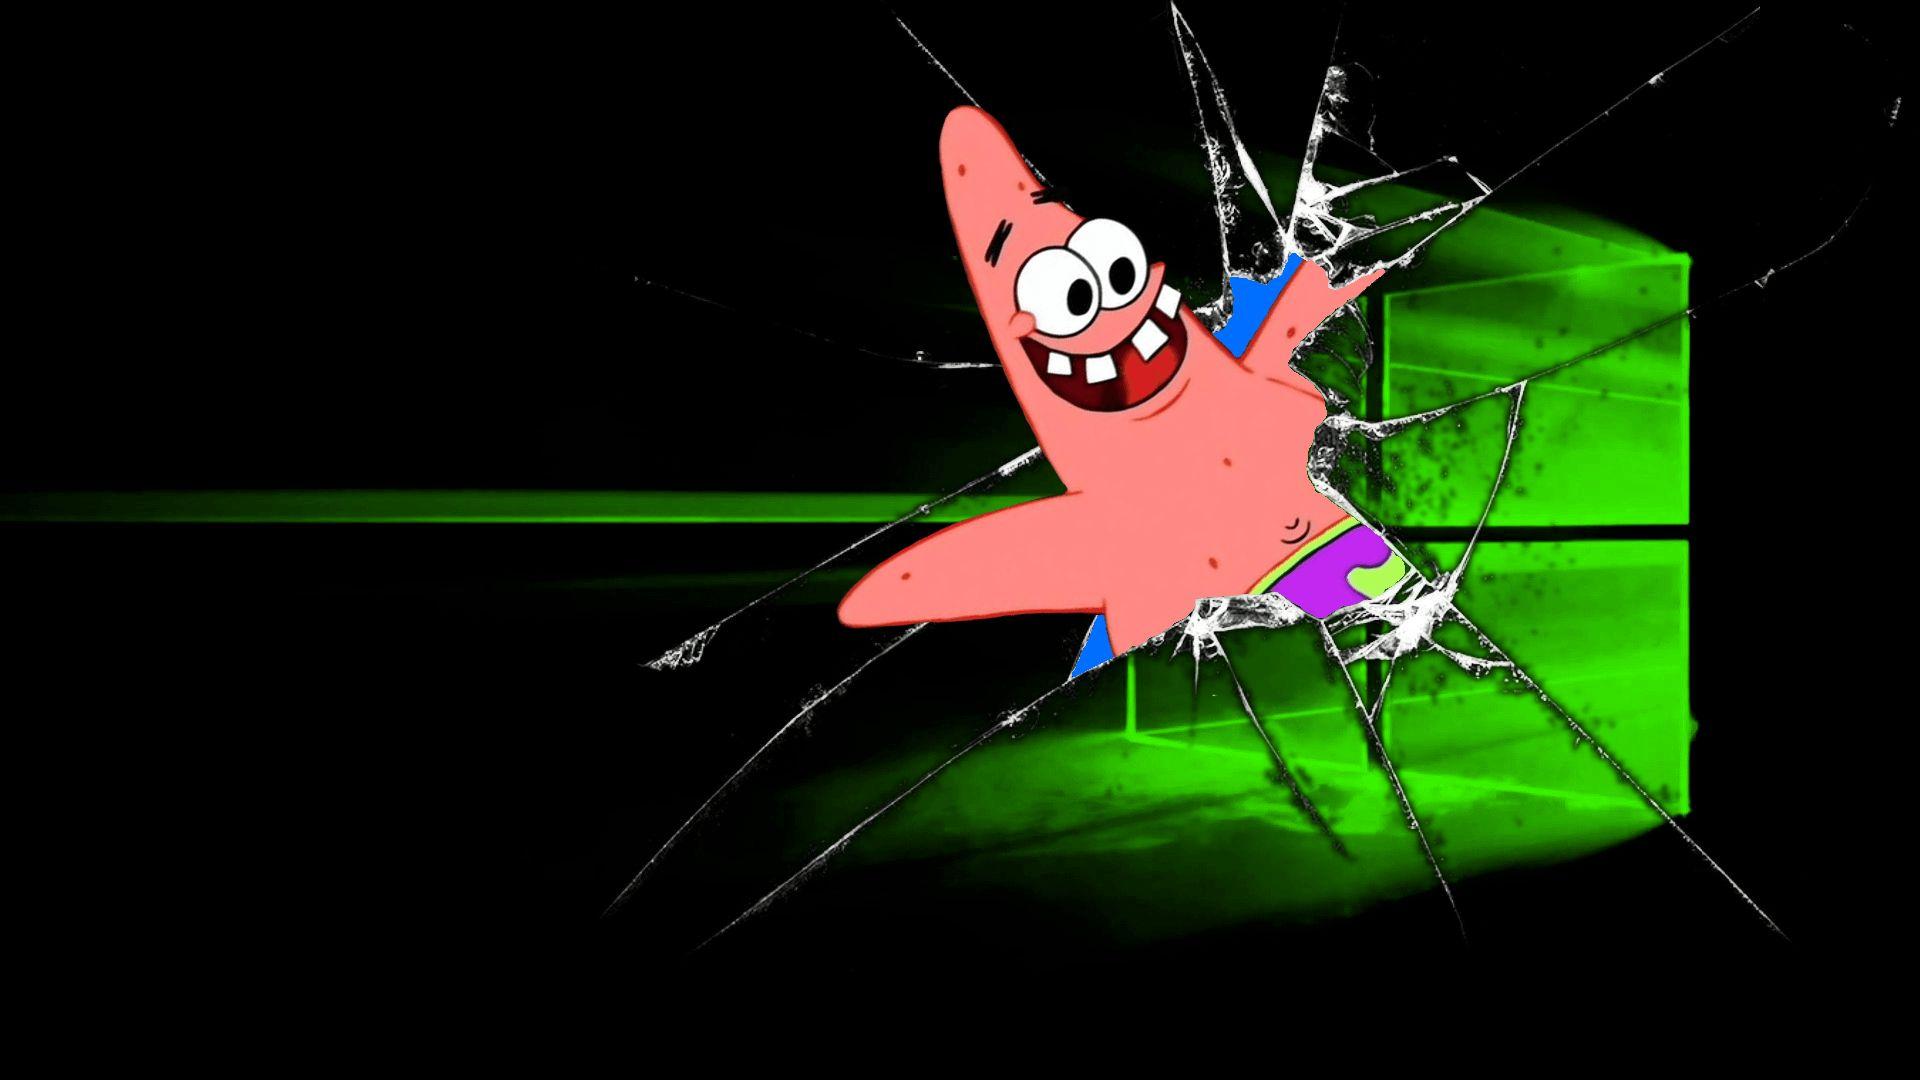 Patrick best Wallpaper